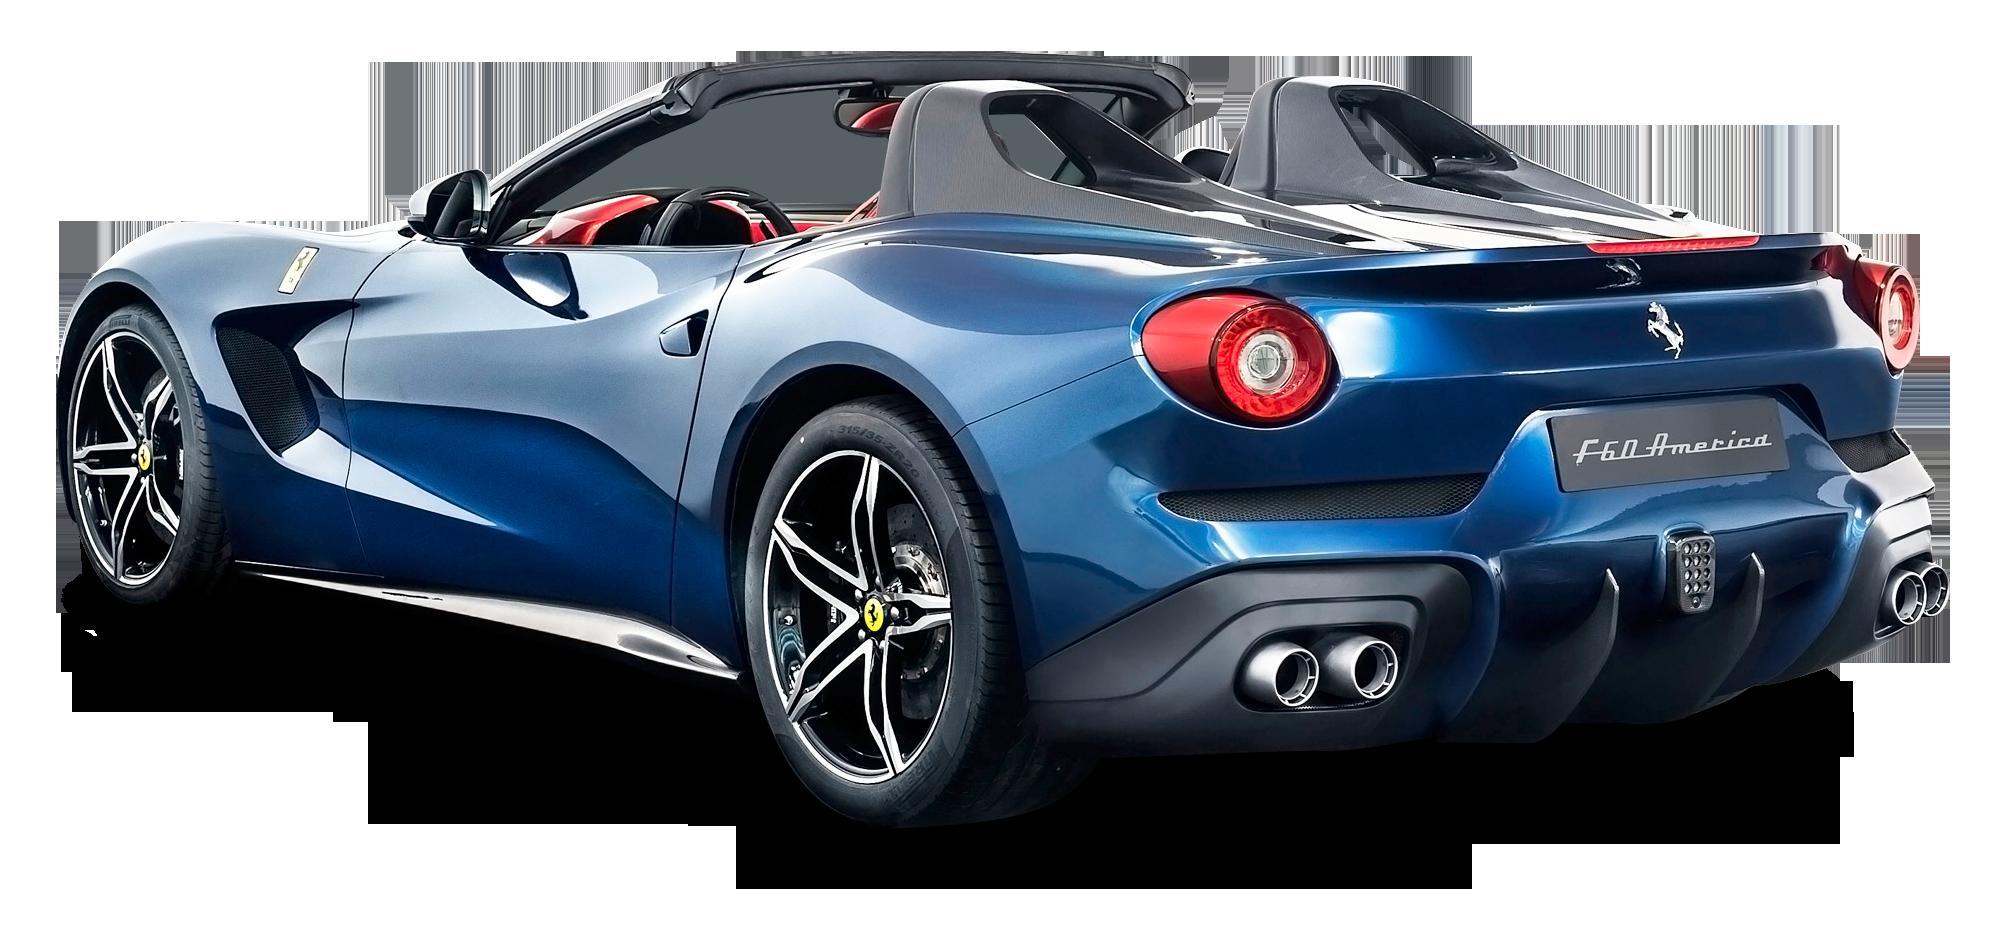 Ferrari F60 America Car PNG Image - Farrari HD PNG